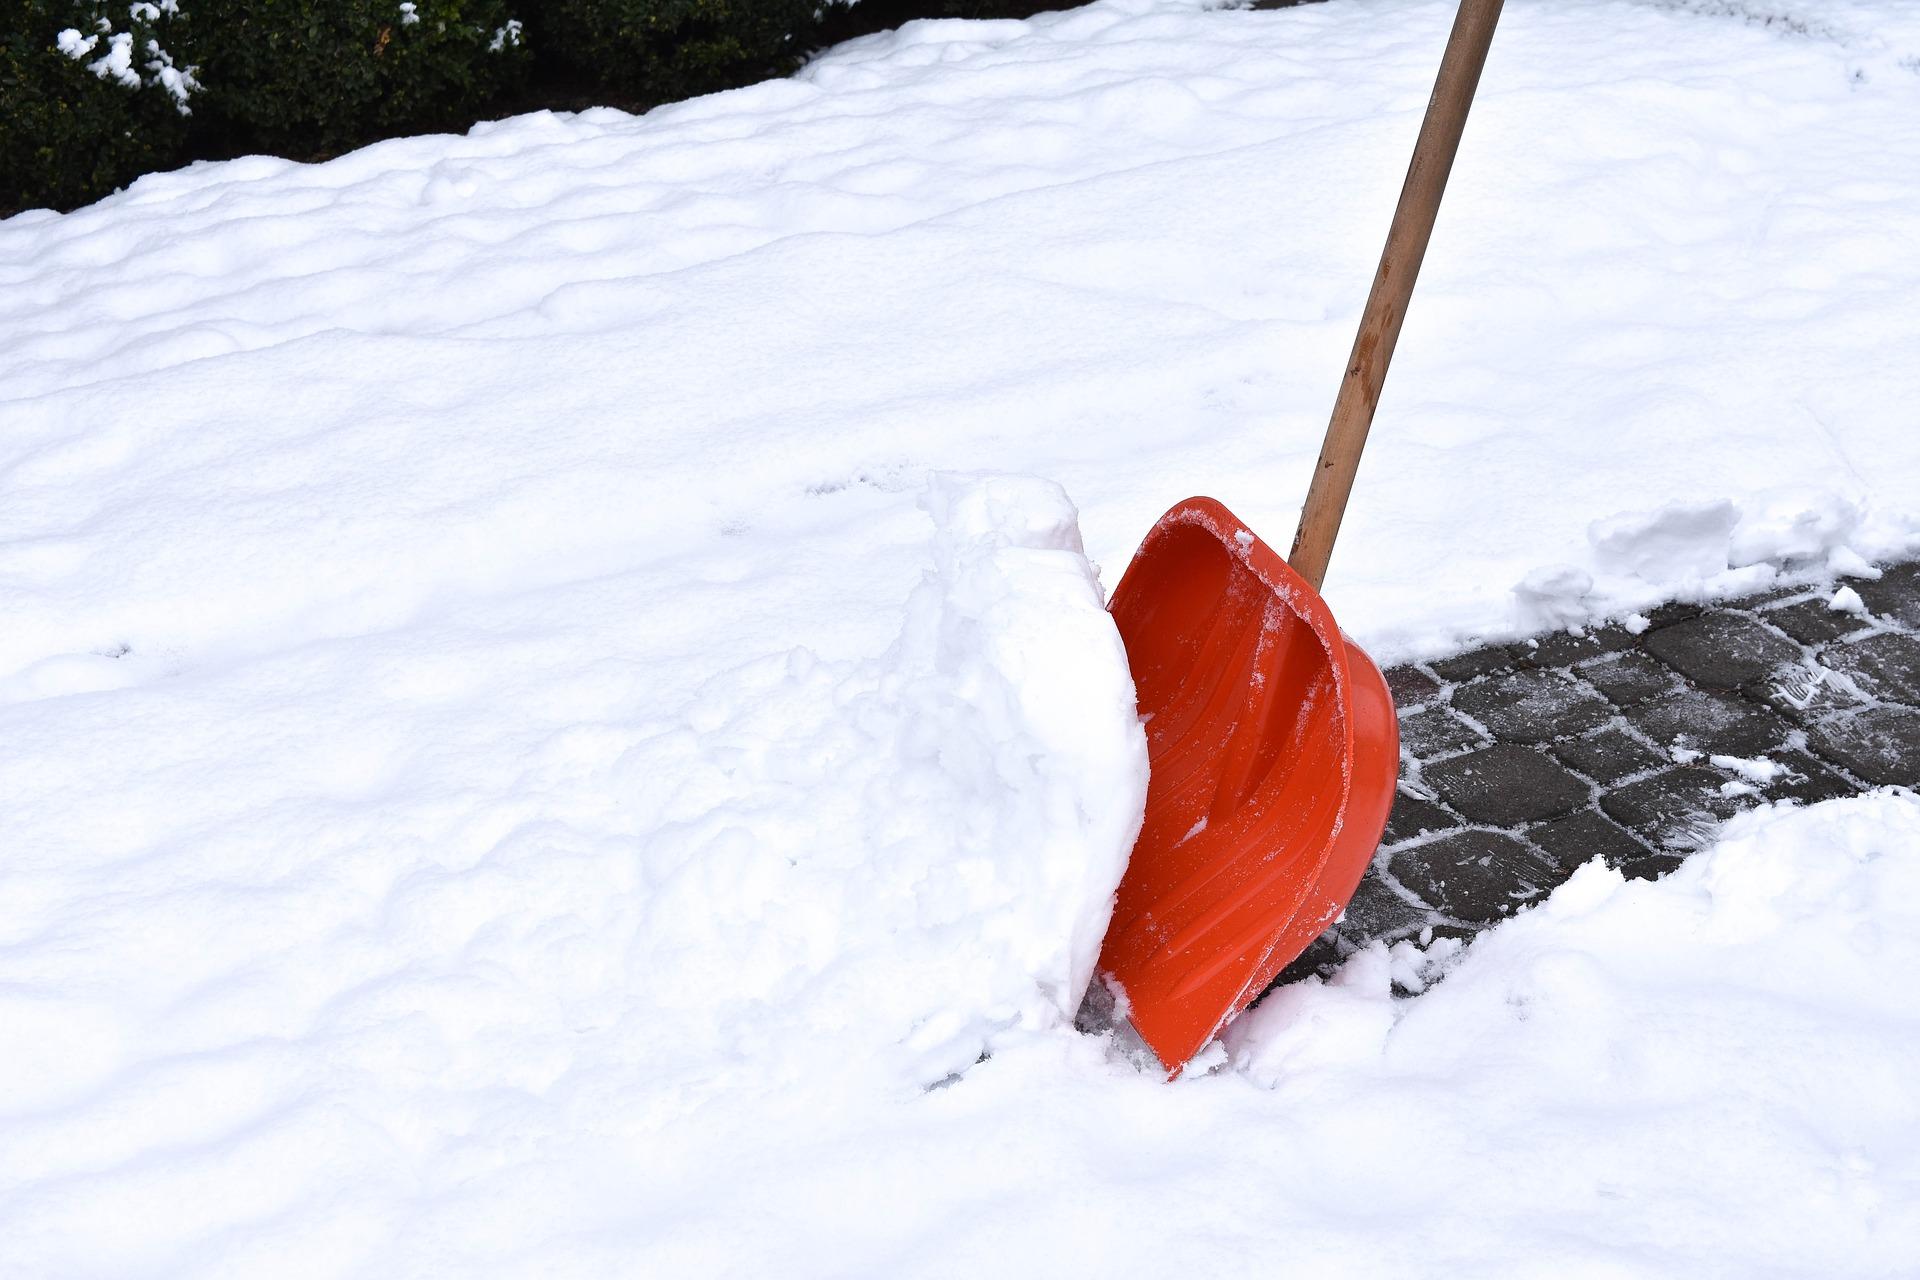 Snømåking Vinter Kristiansand